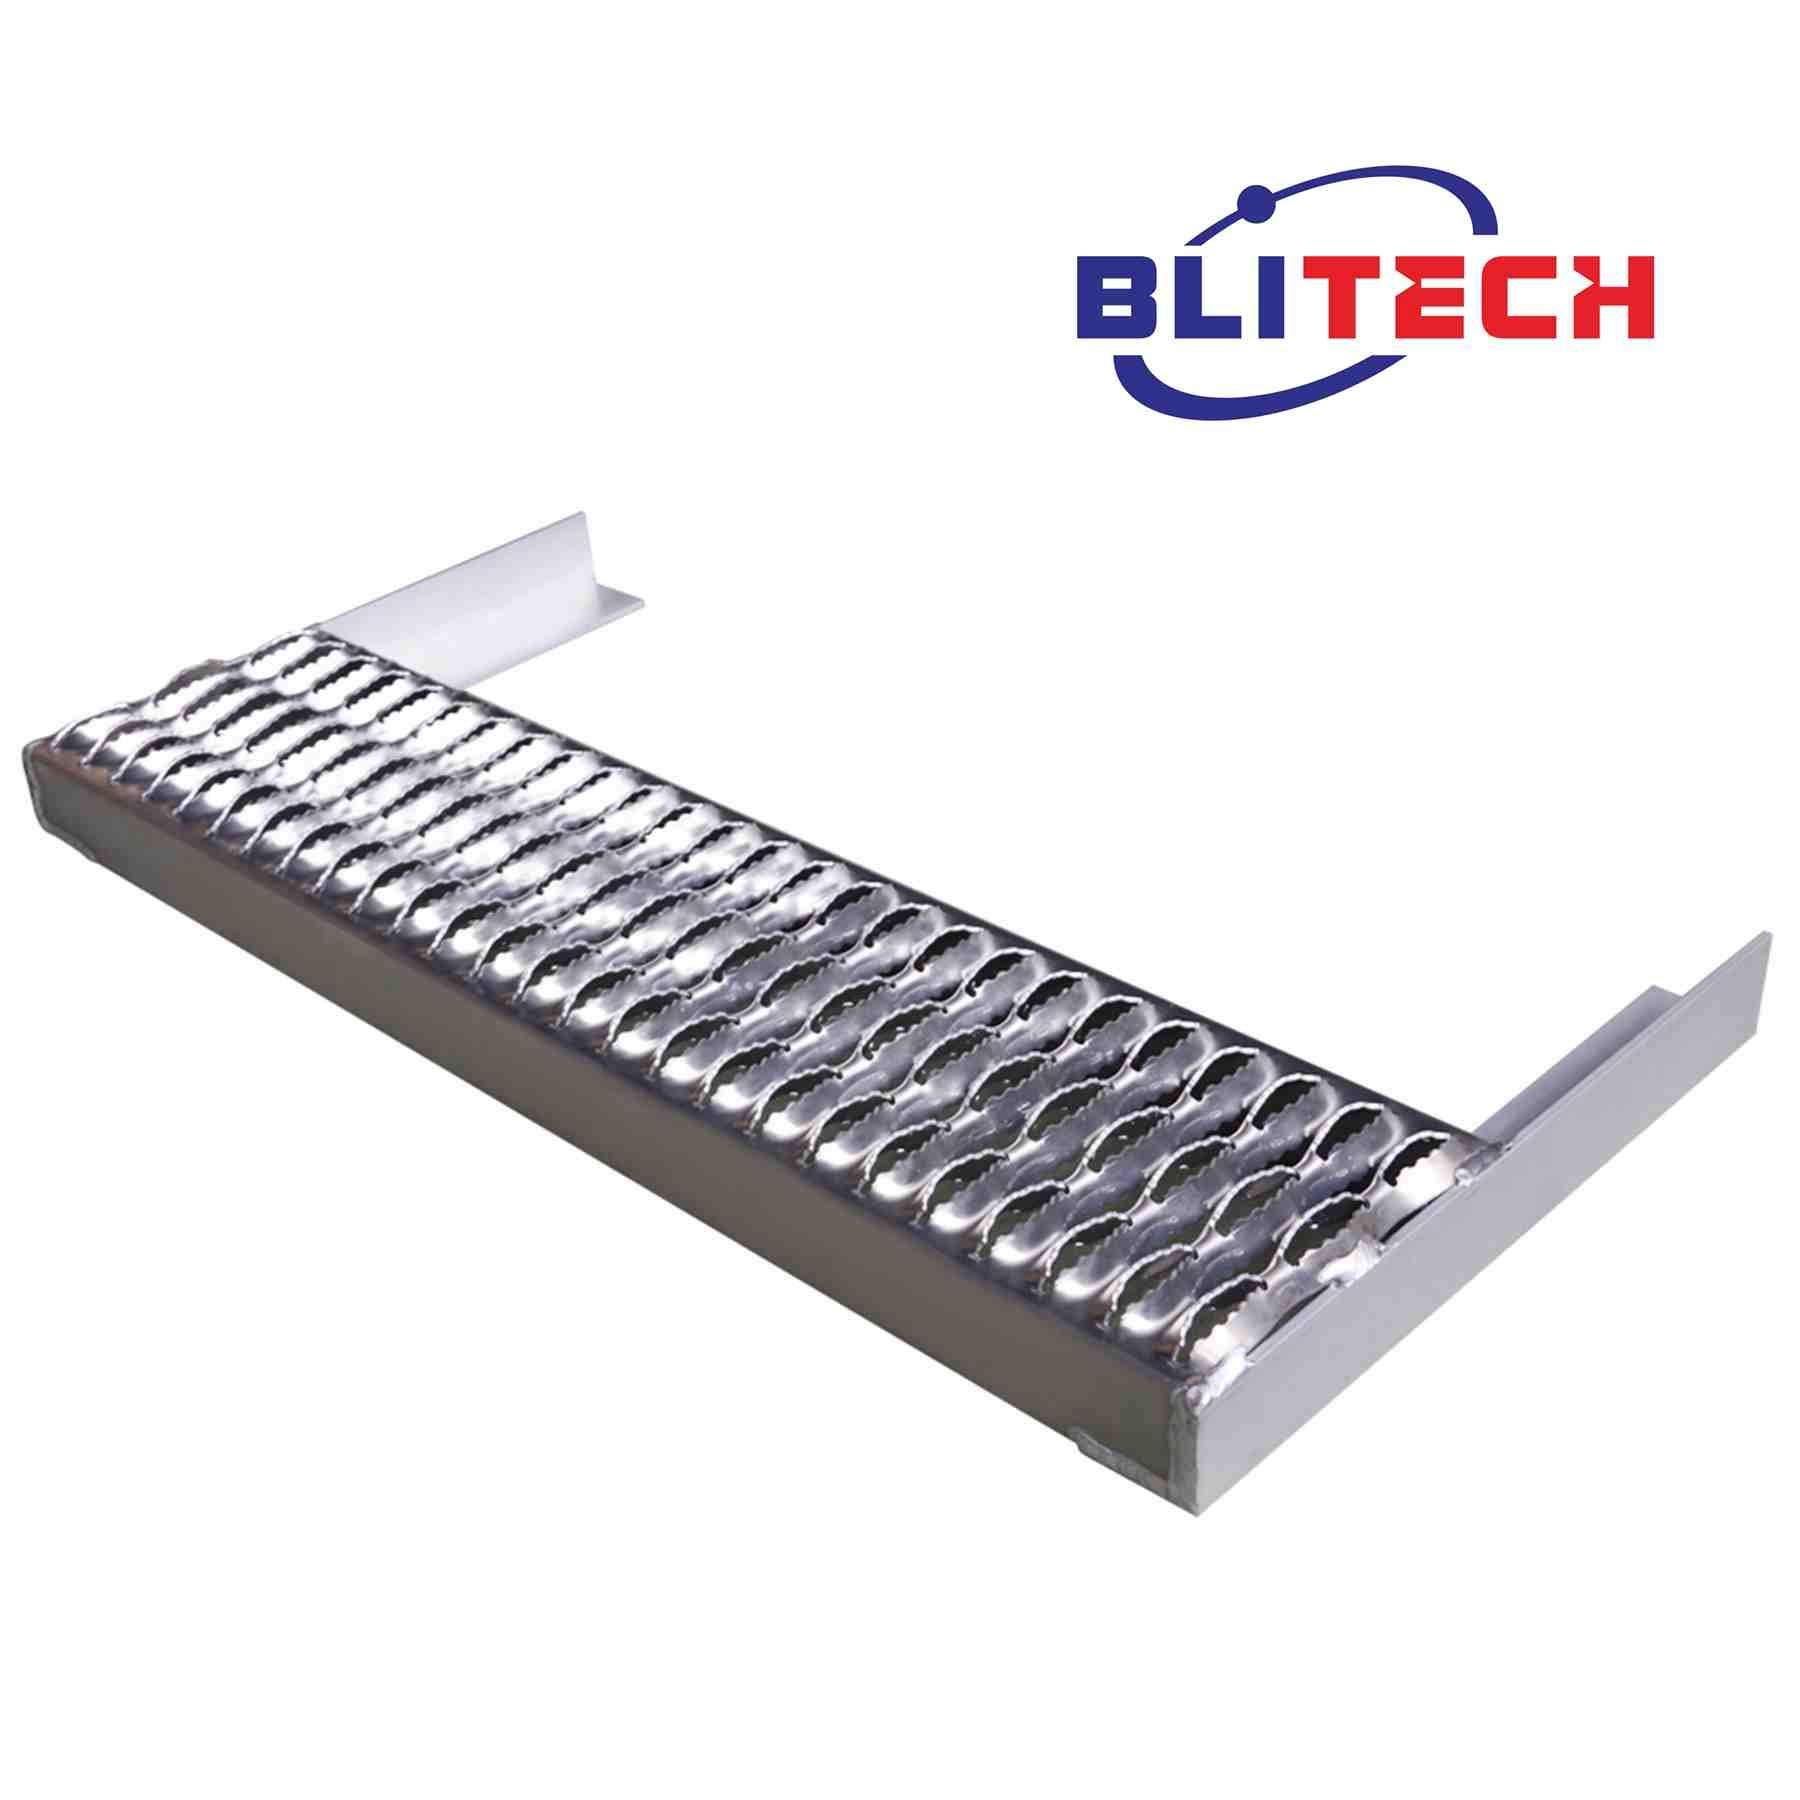 Blitech Peterbilt 379 of 29.5 inch Size Battery Box Heavy Duty Step Replacement Kit - 388 389